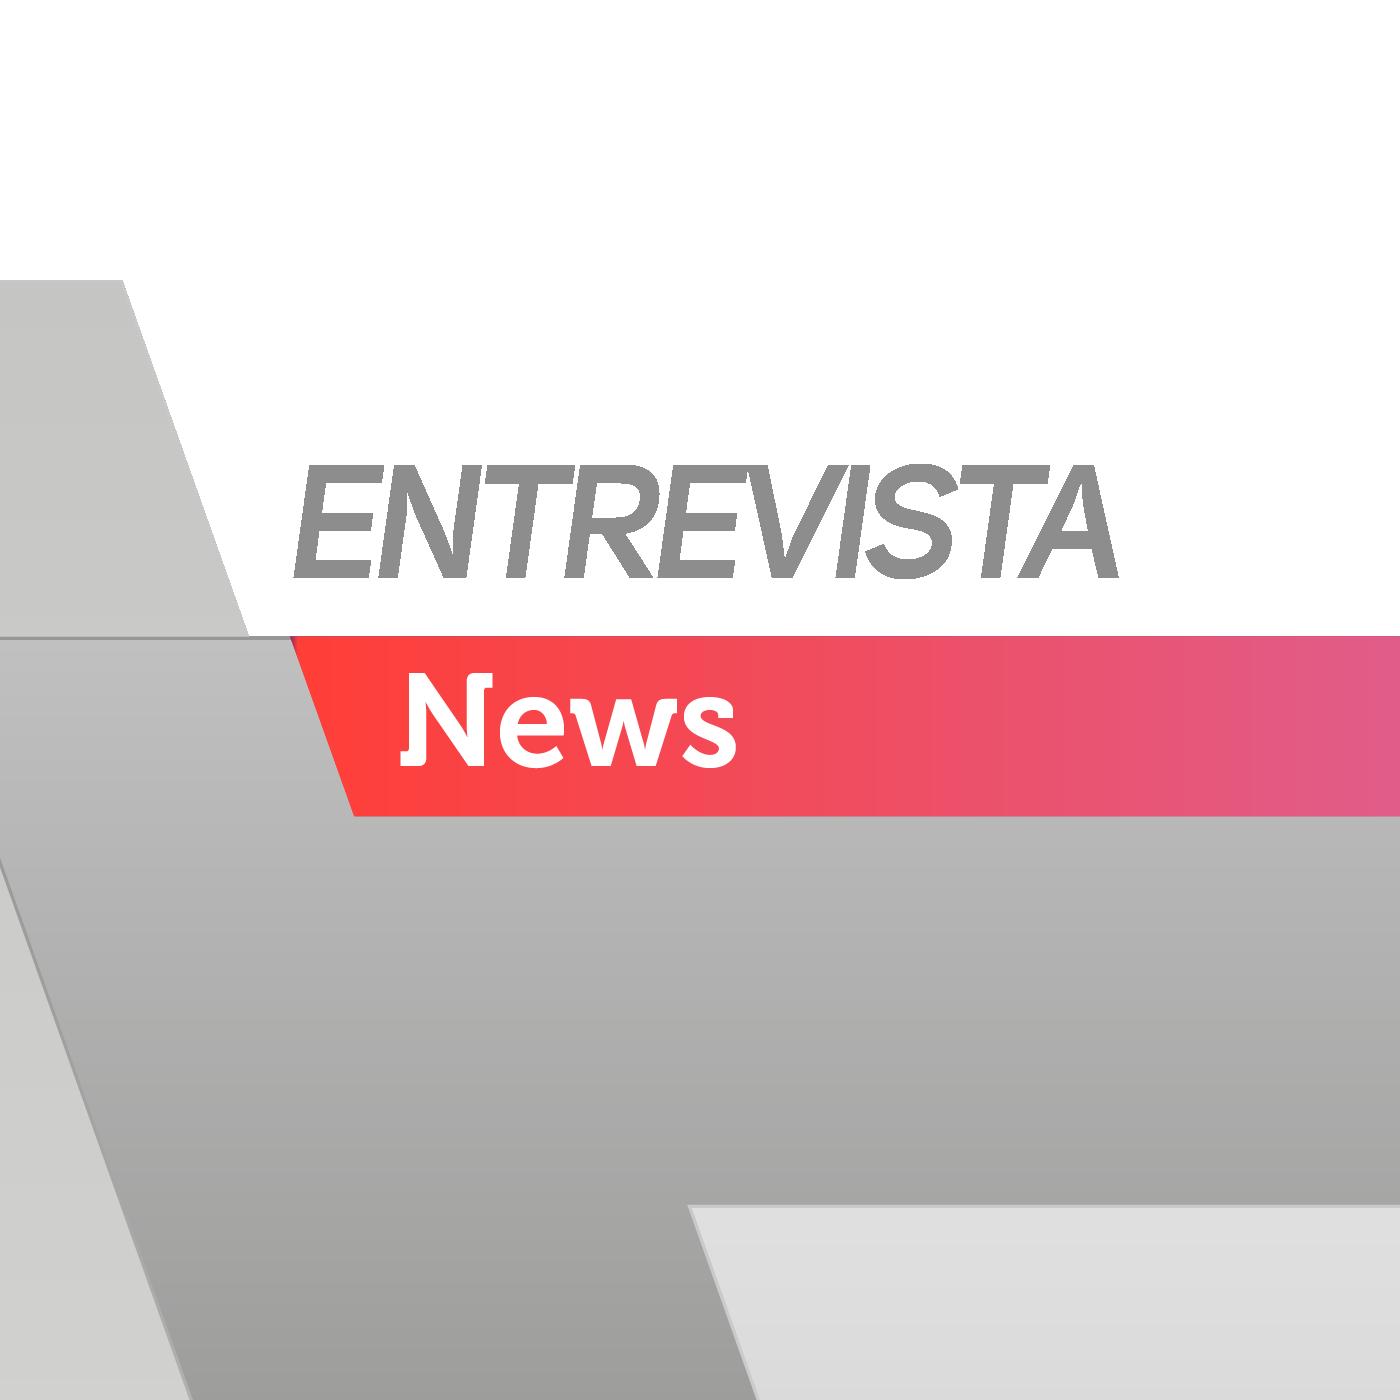 Ouça a entrevista com Hiratan Pinheiro da Silva, superintendente do DNIT, ao Estúdio Gaúcha